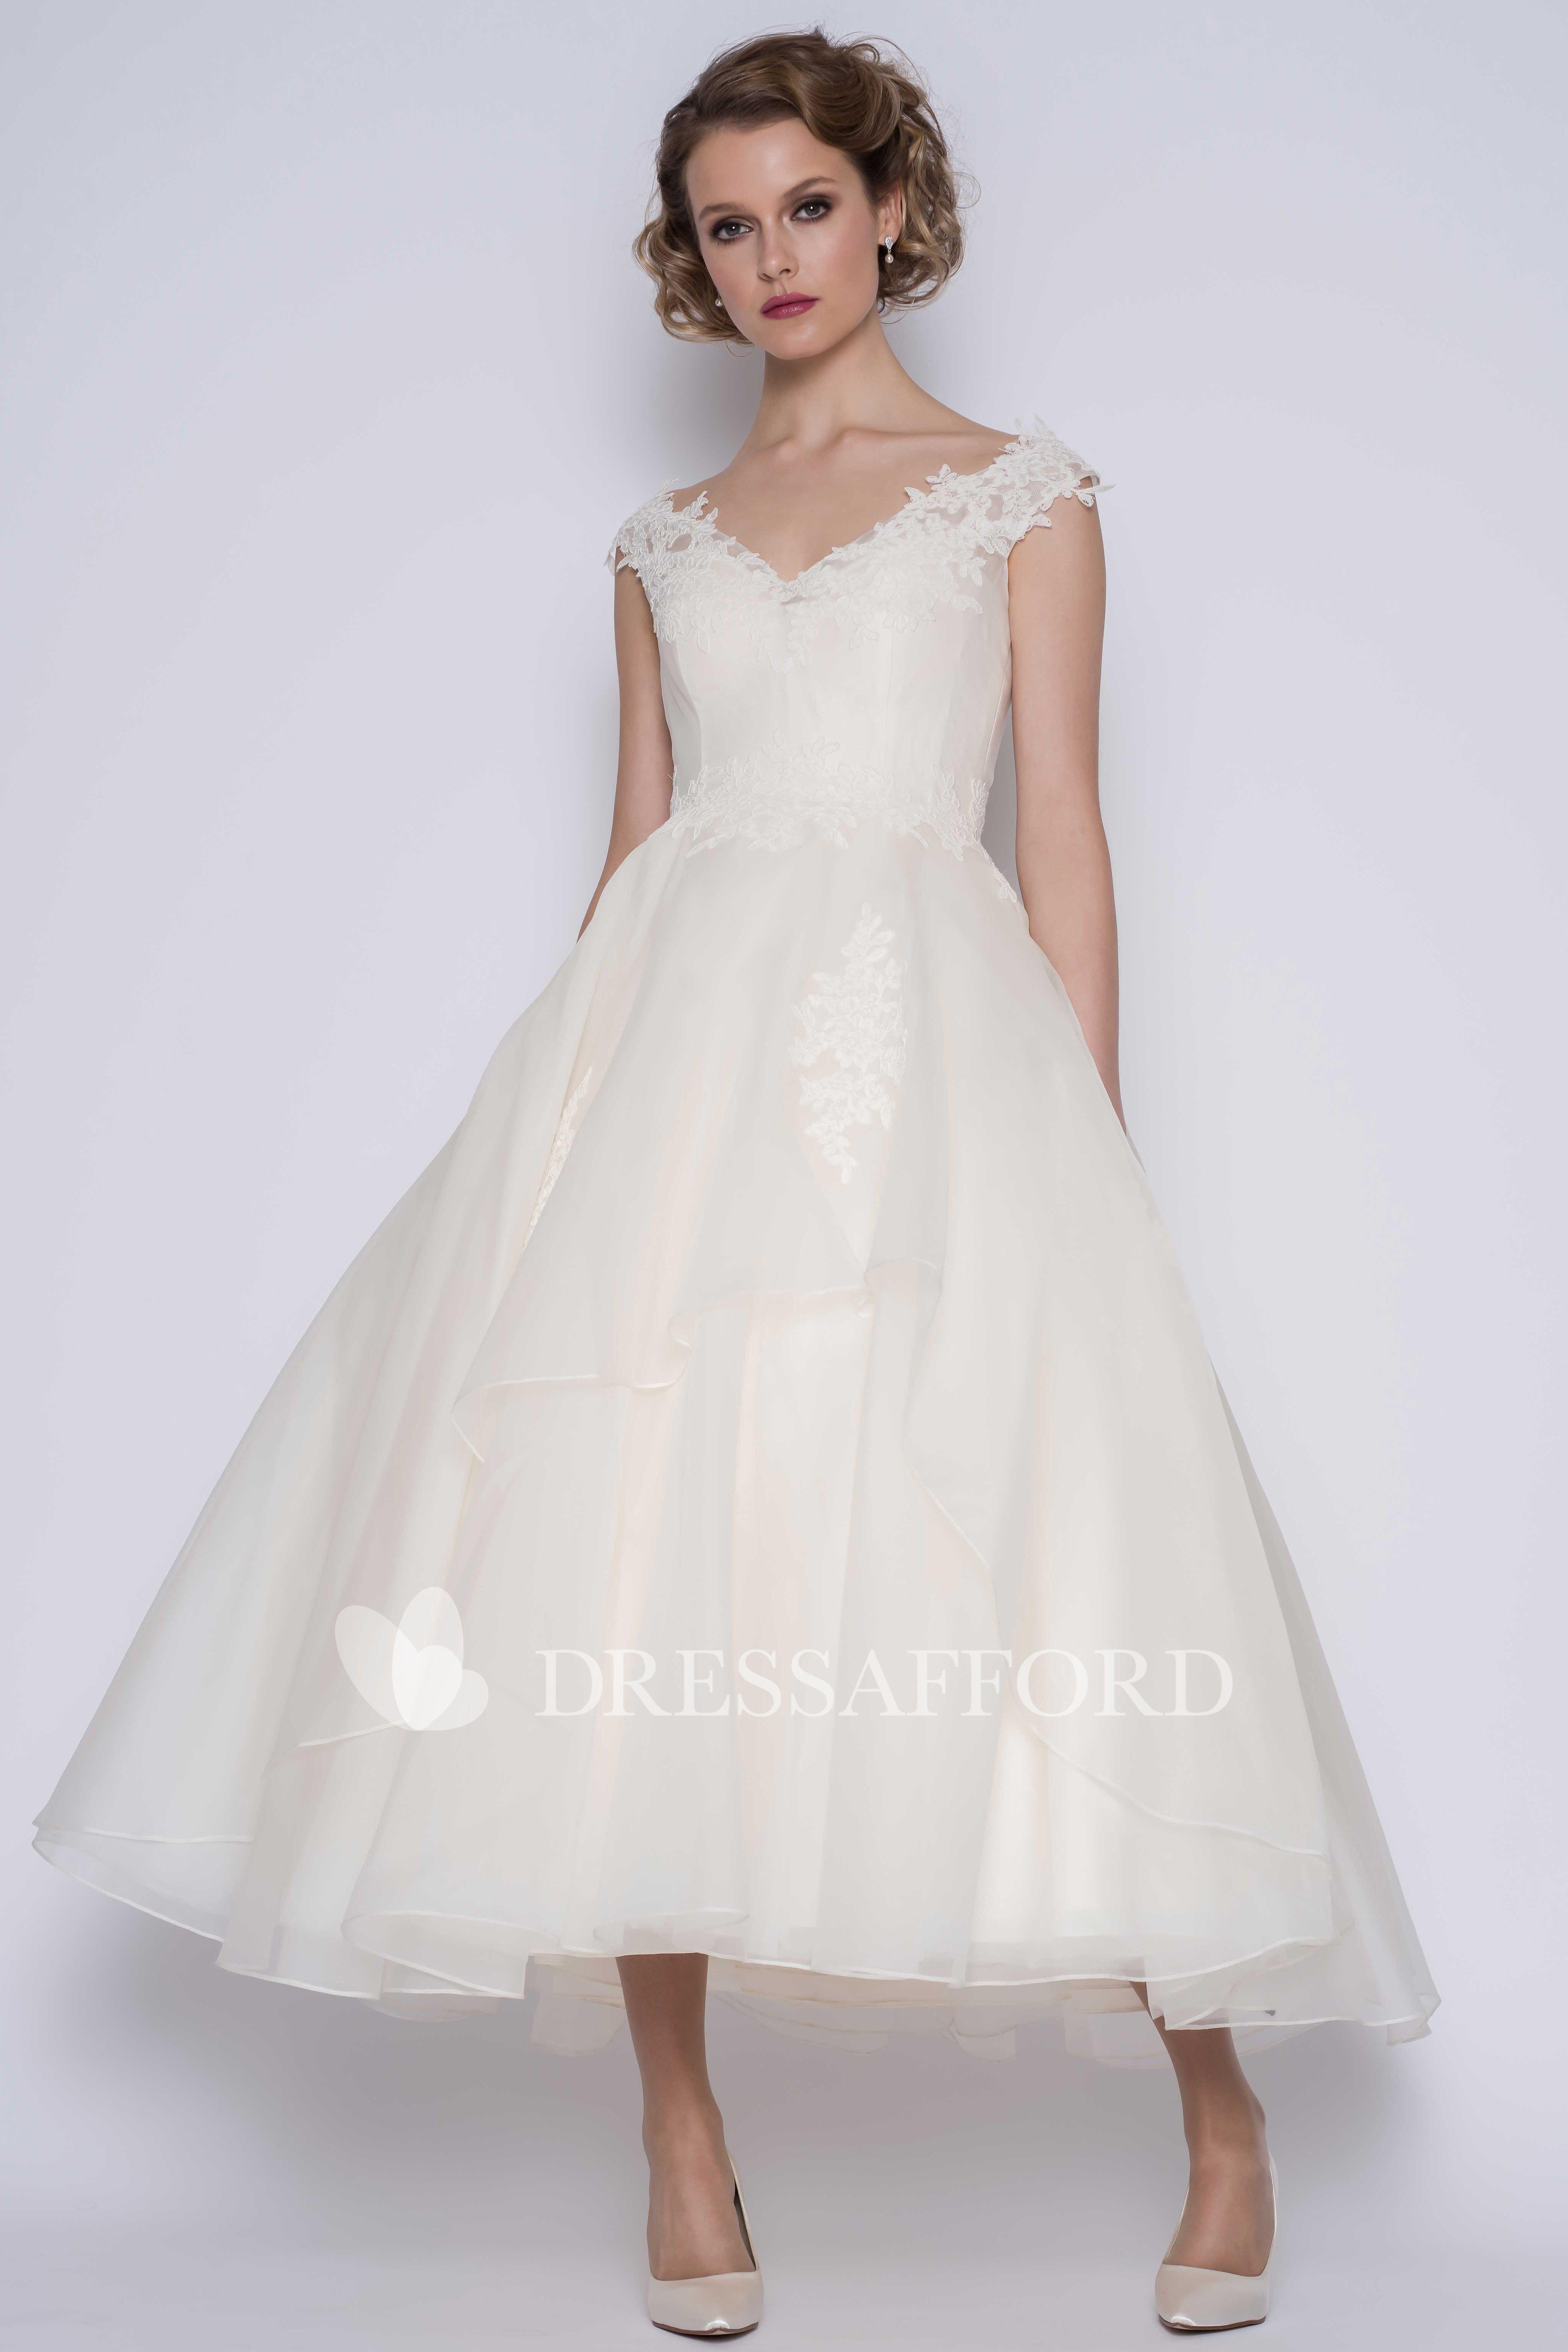 Elegant Organza Ball Gown V Neck Cap Sleeve Ankle Length Wedding Dress Dress Afford Ankle Length Wedding Dress Wedding Dresses 50s Wedding Dress Types [ 6173 x 4116 Pixel ]